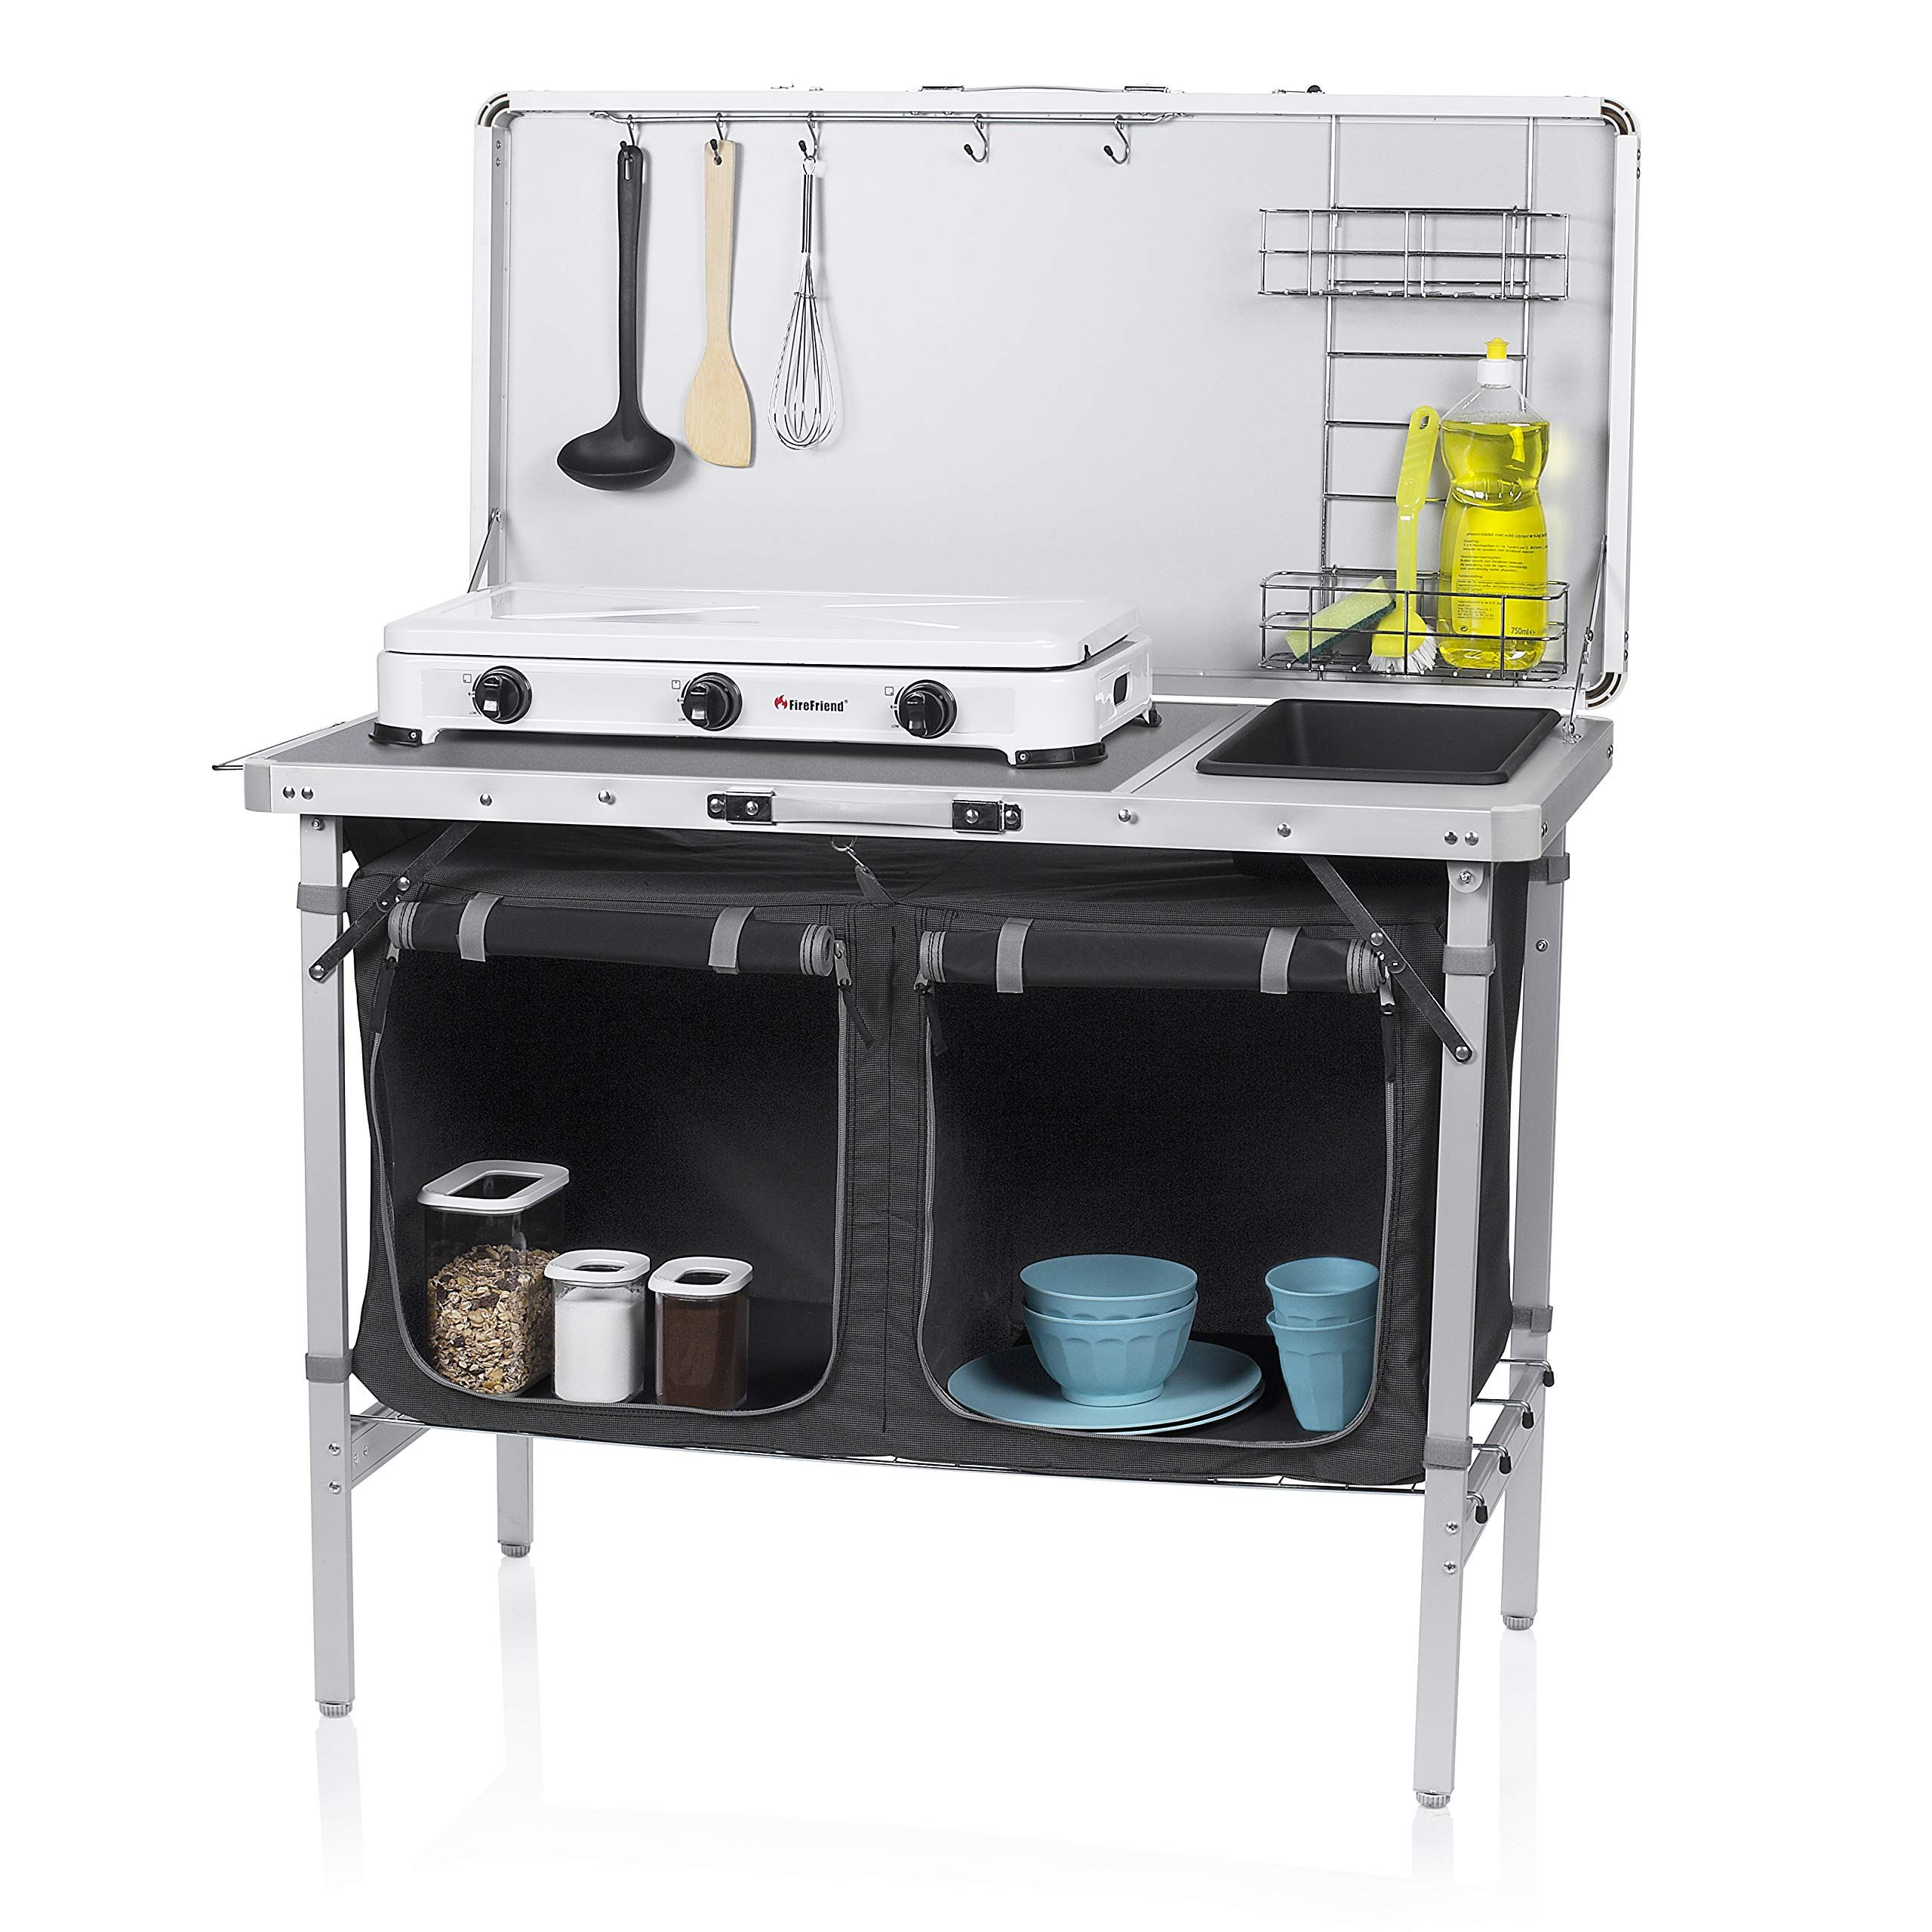 Campart Travel Ki 0757 Camping Kitchen Granada In 2020 Camping Kitchen Table Camp Kitchen Kitchen Storage